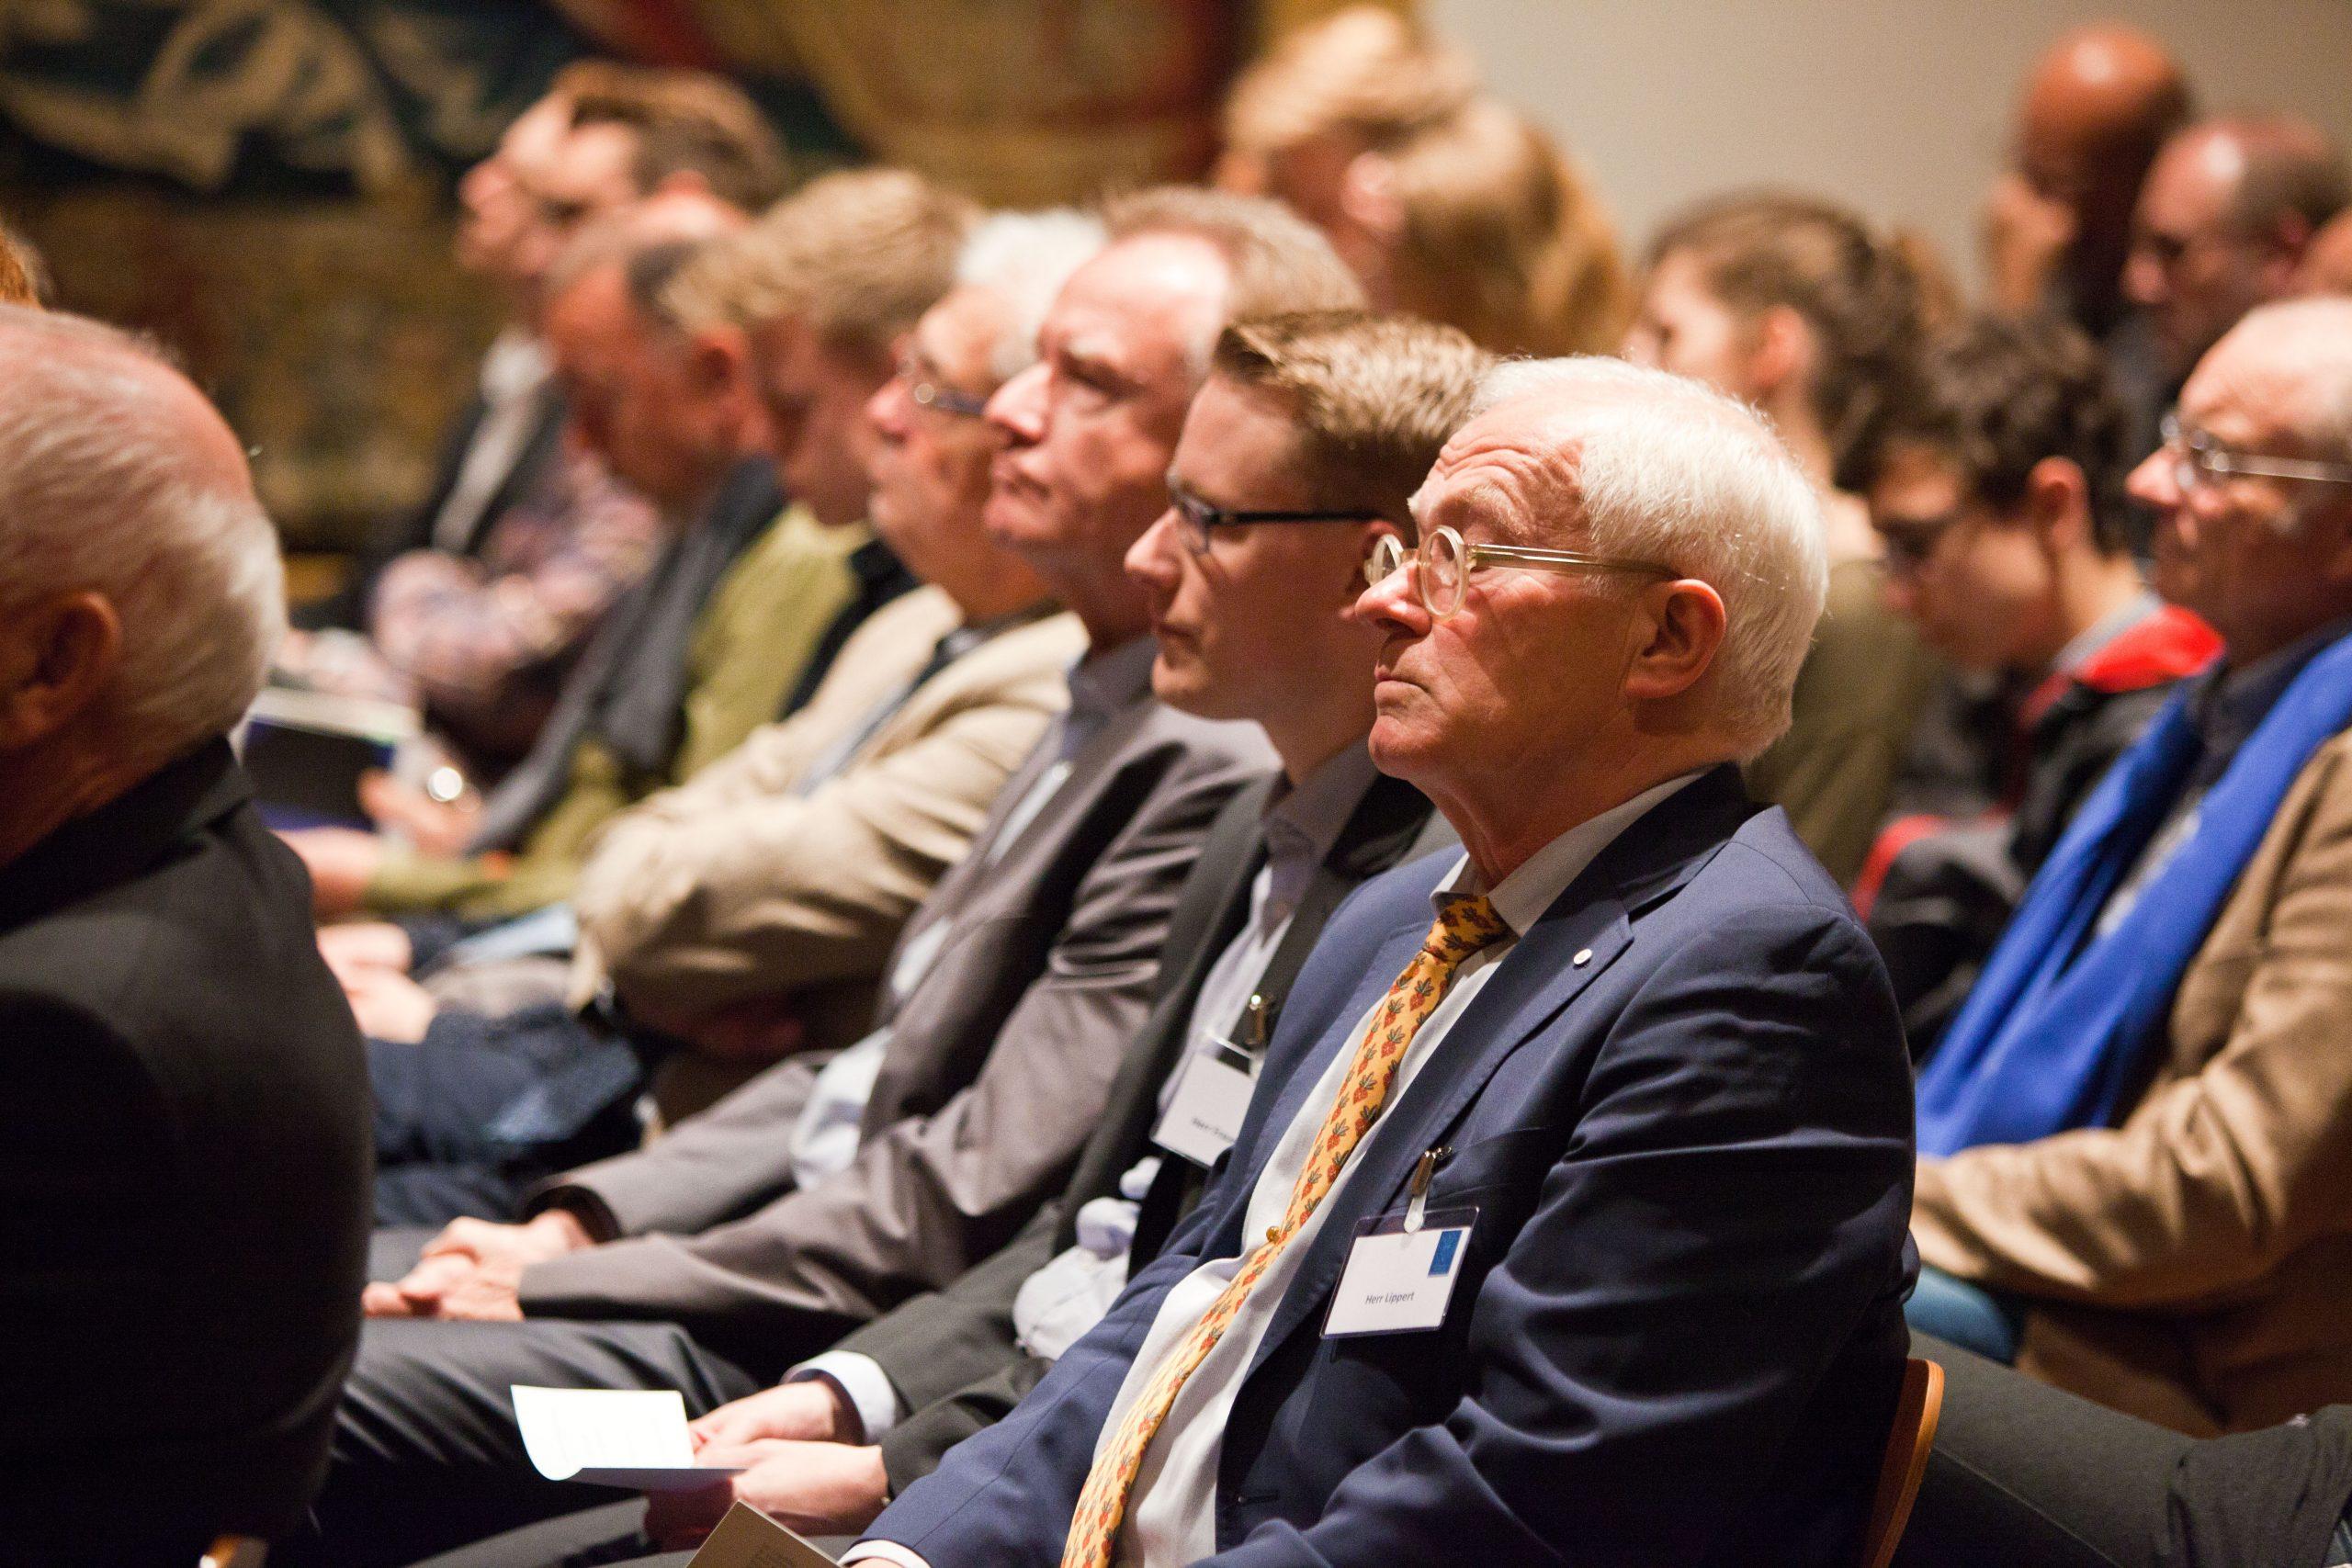 Blick ins Publikum. Foto: Pressebüro Stefan Pfister/Schweinfurt